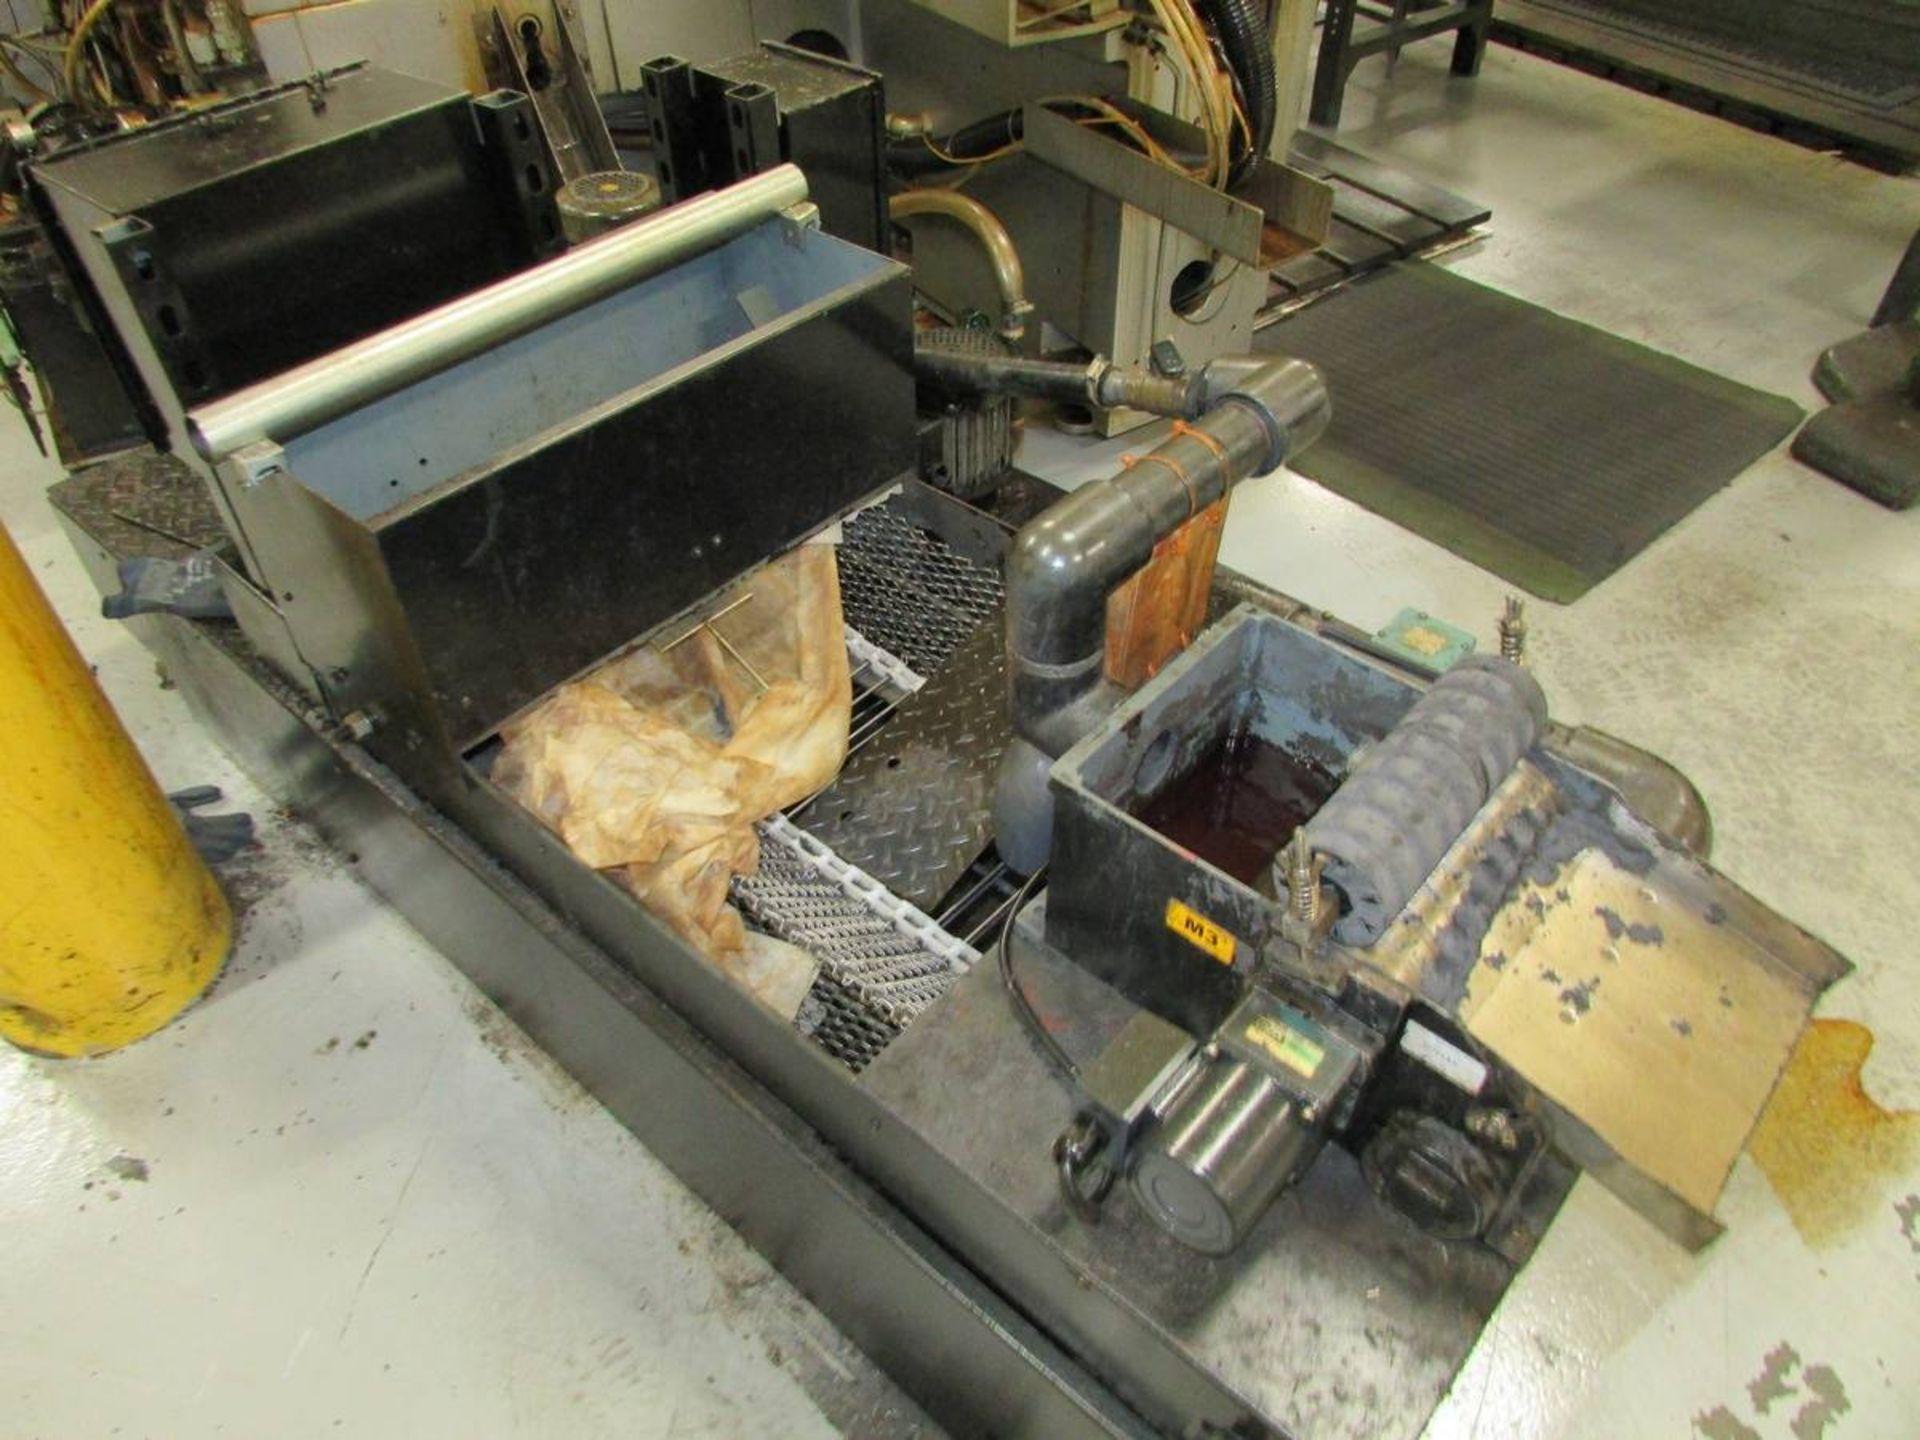 2012 Toyoda/ JTEKT 45m Select G II CNC OD Cylindrical Grinder - Image 14 of 21